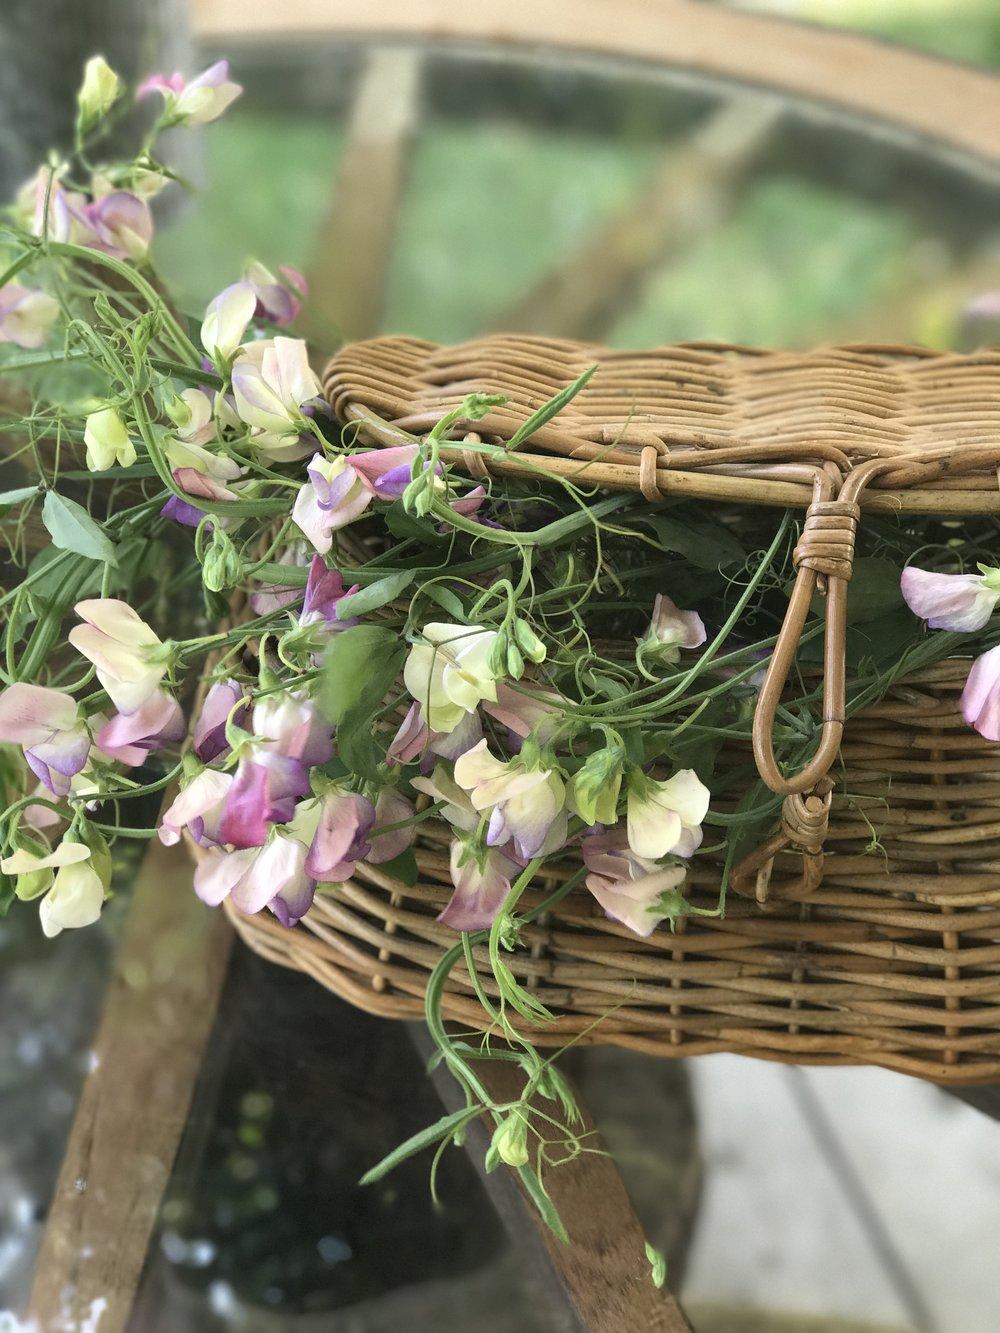 Sweet Peas in a Basket